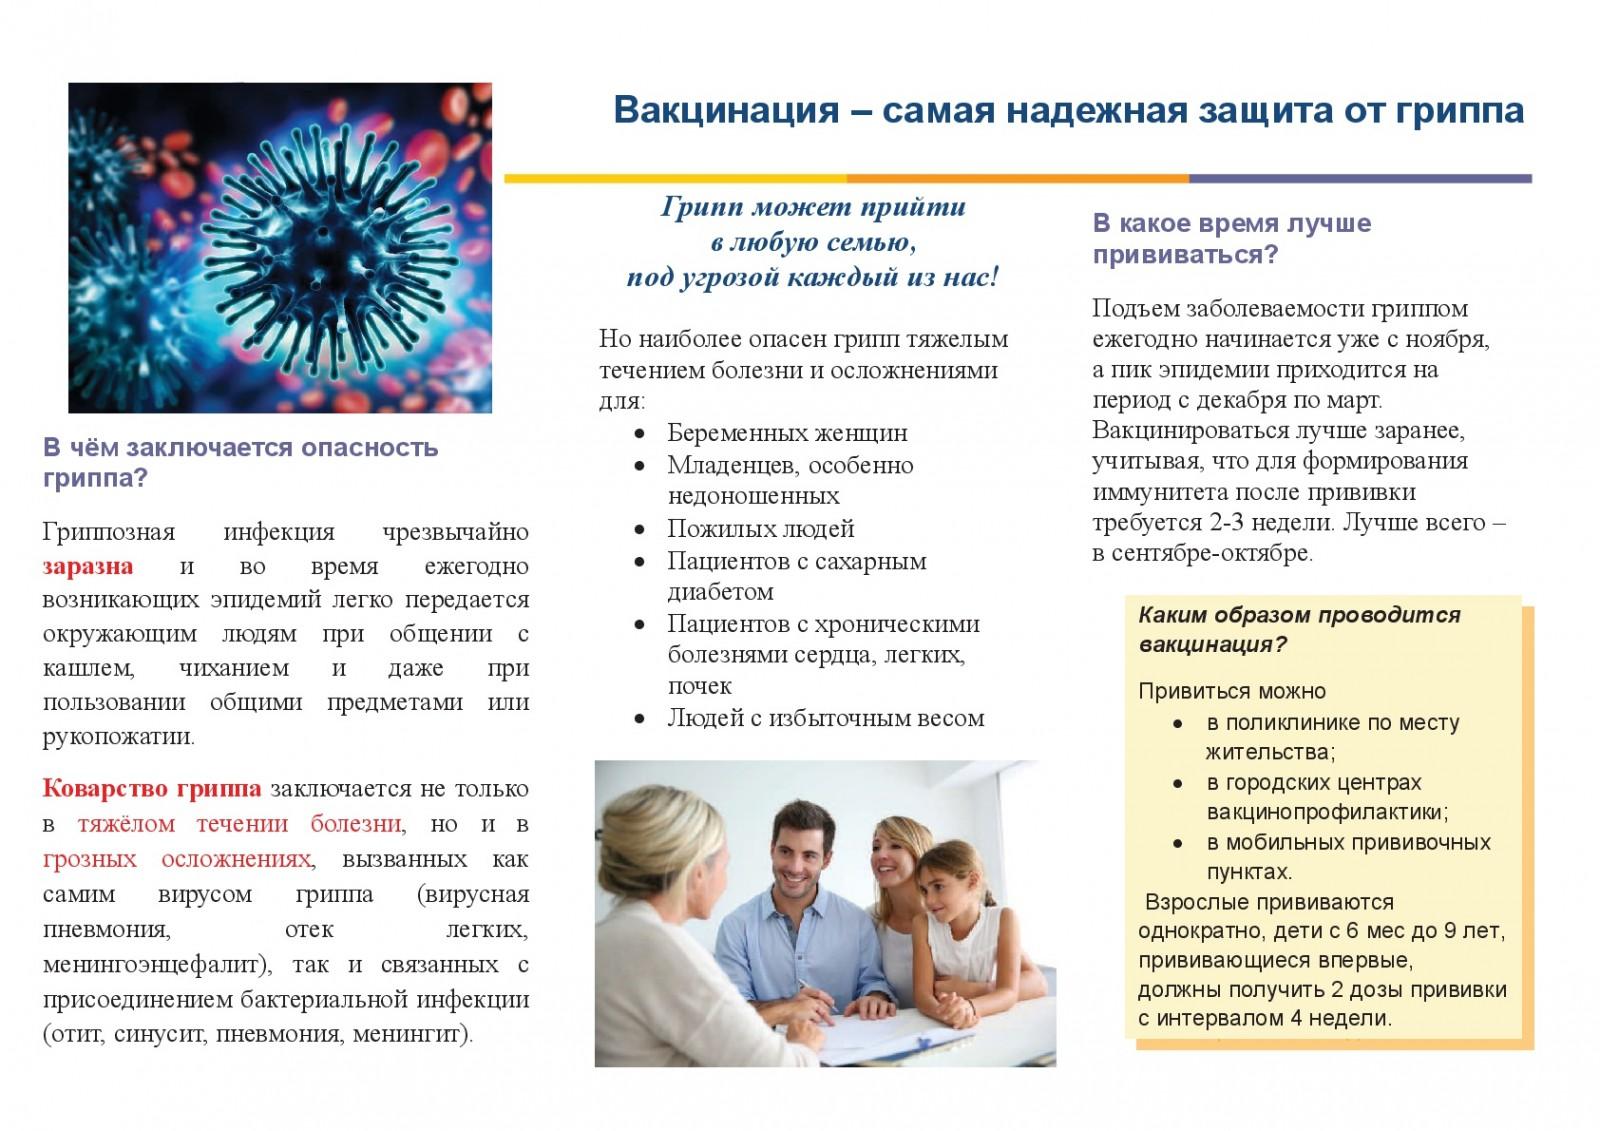 https://etu.ru/assets/images/soc-vosp/health/listovka_2-001.jpg